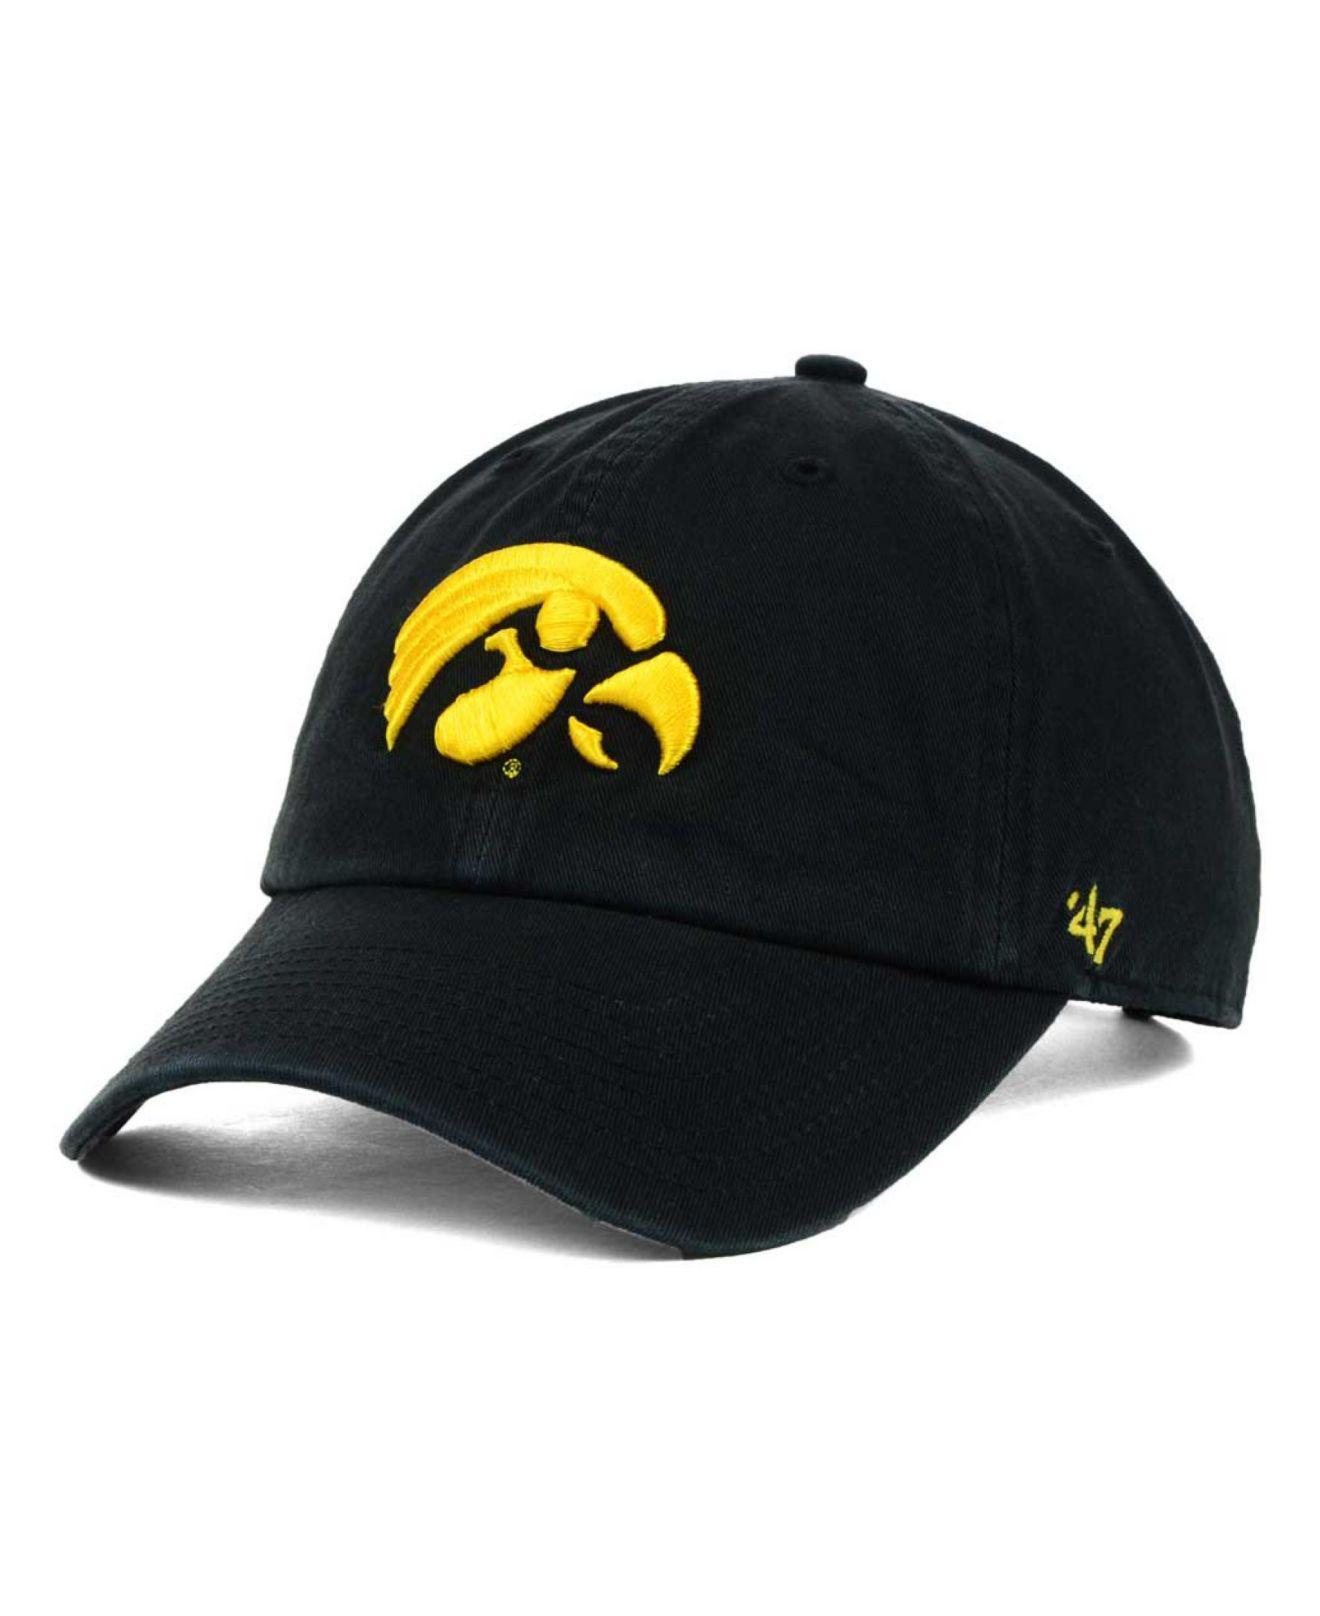 c3908b88281cd Lyst - 47 Brand Iowa Hawkeyes Clean-up Cap in Black for Men